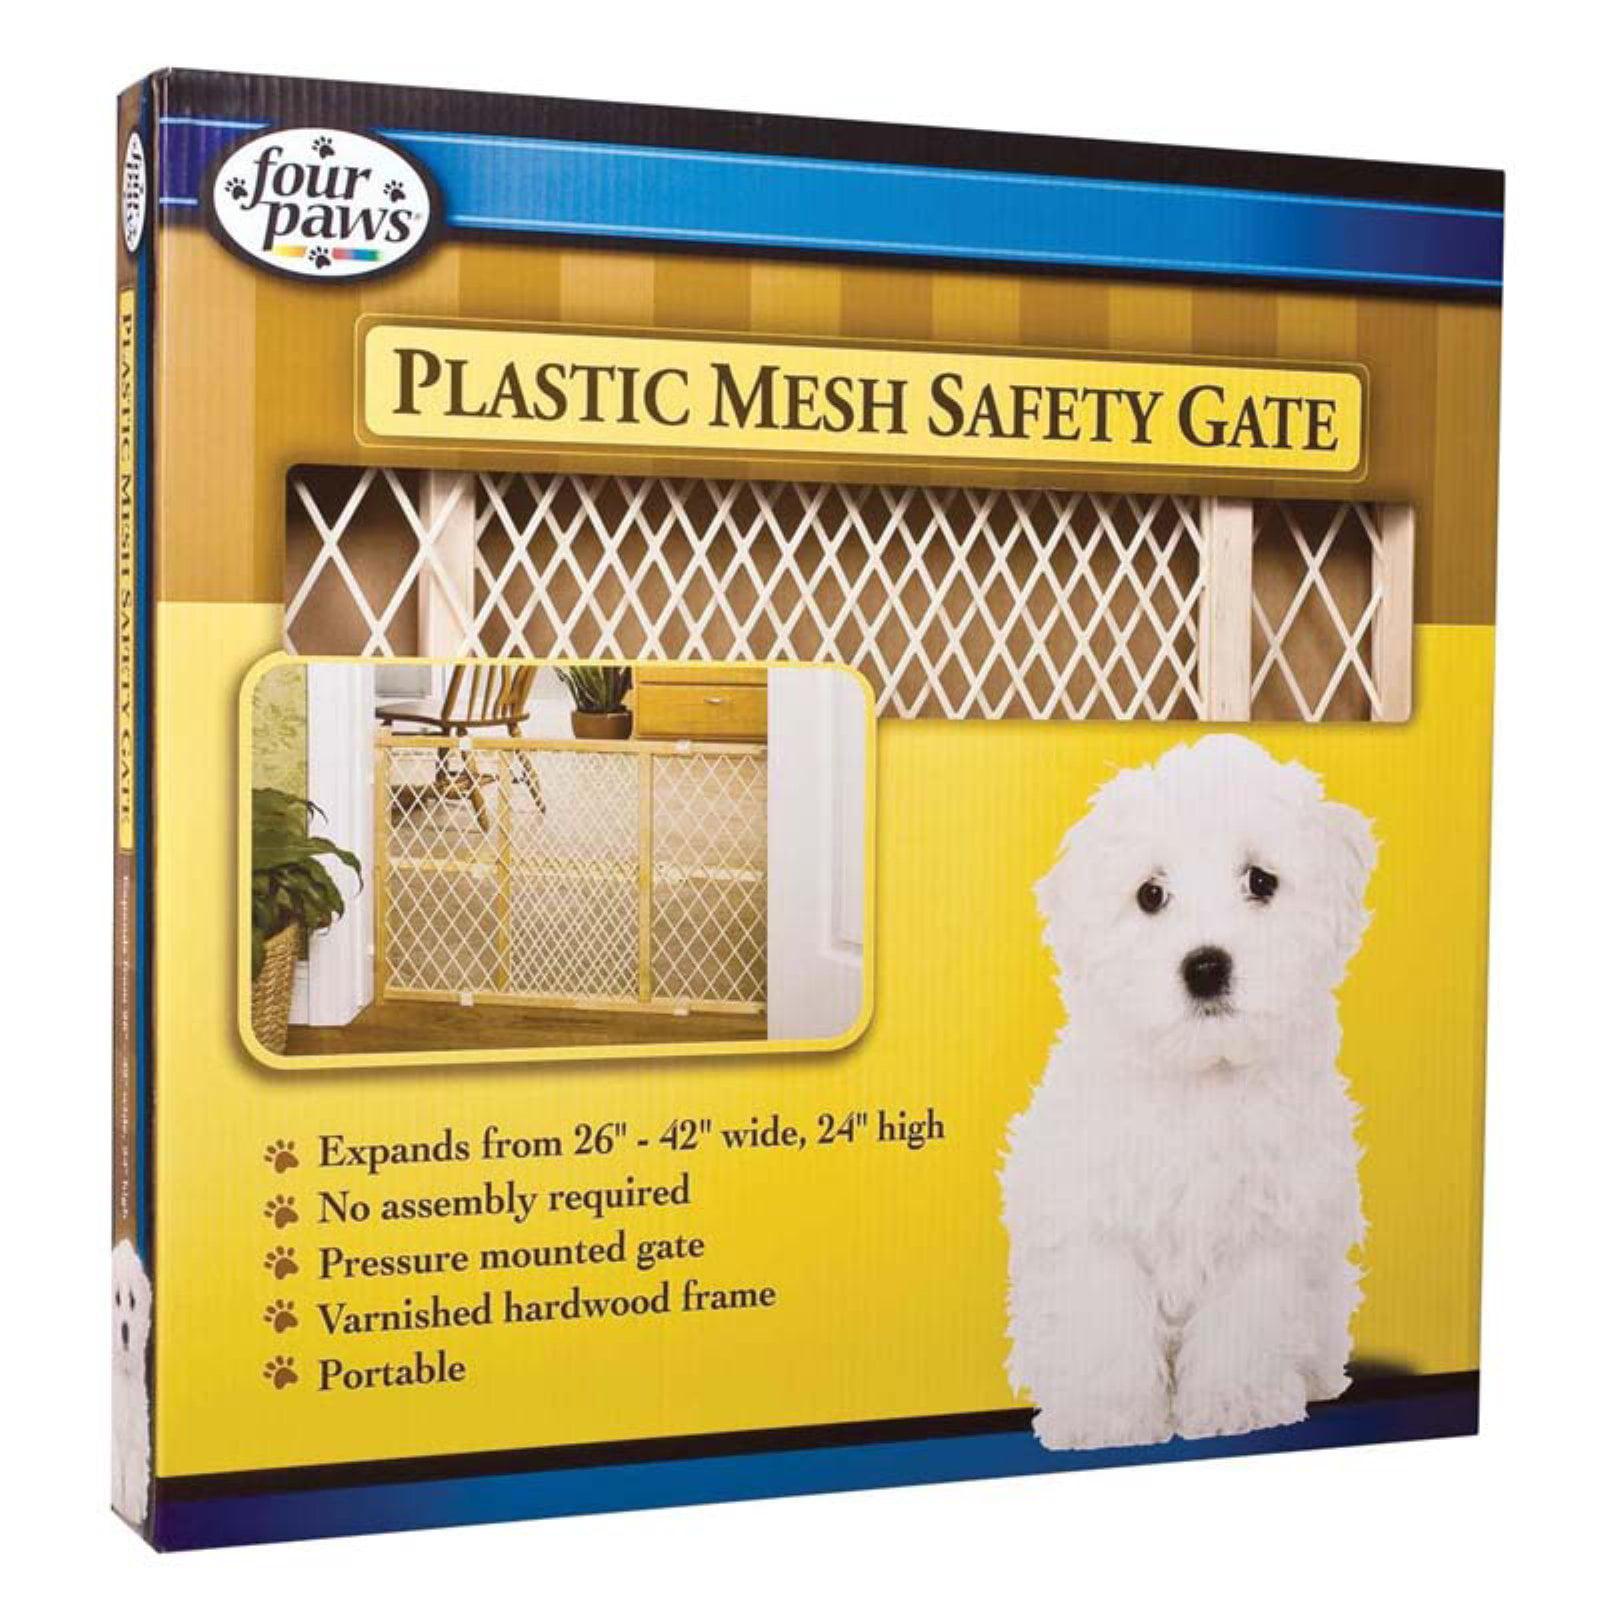 Four Paws Plastic Mesh Wood Frame Pet Gate